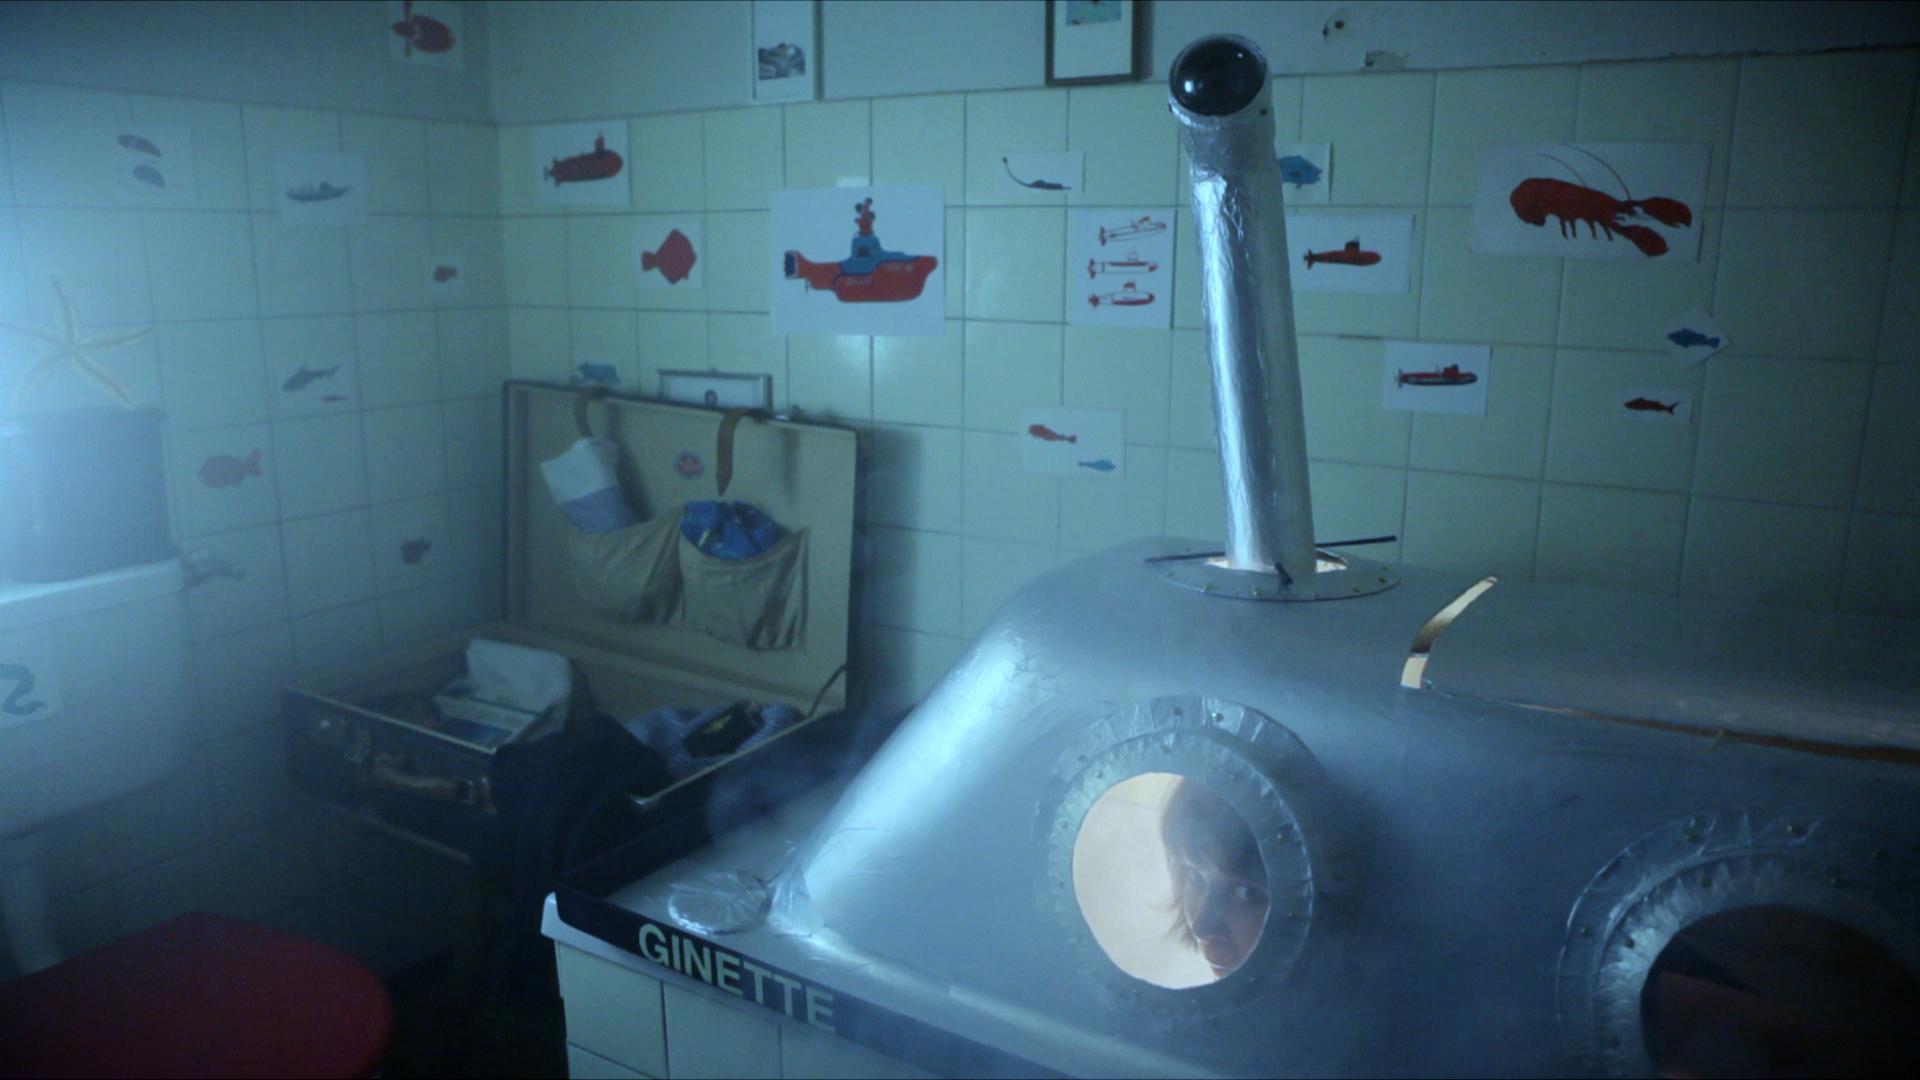 ginette dans sous-marin